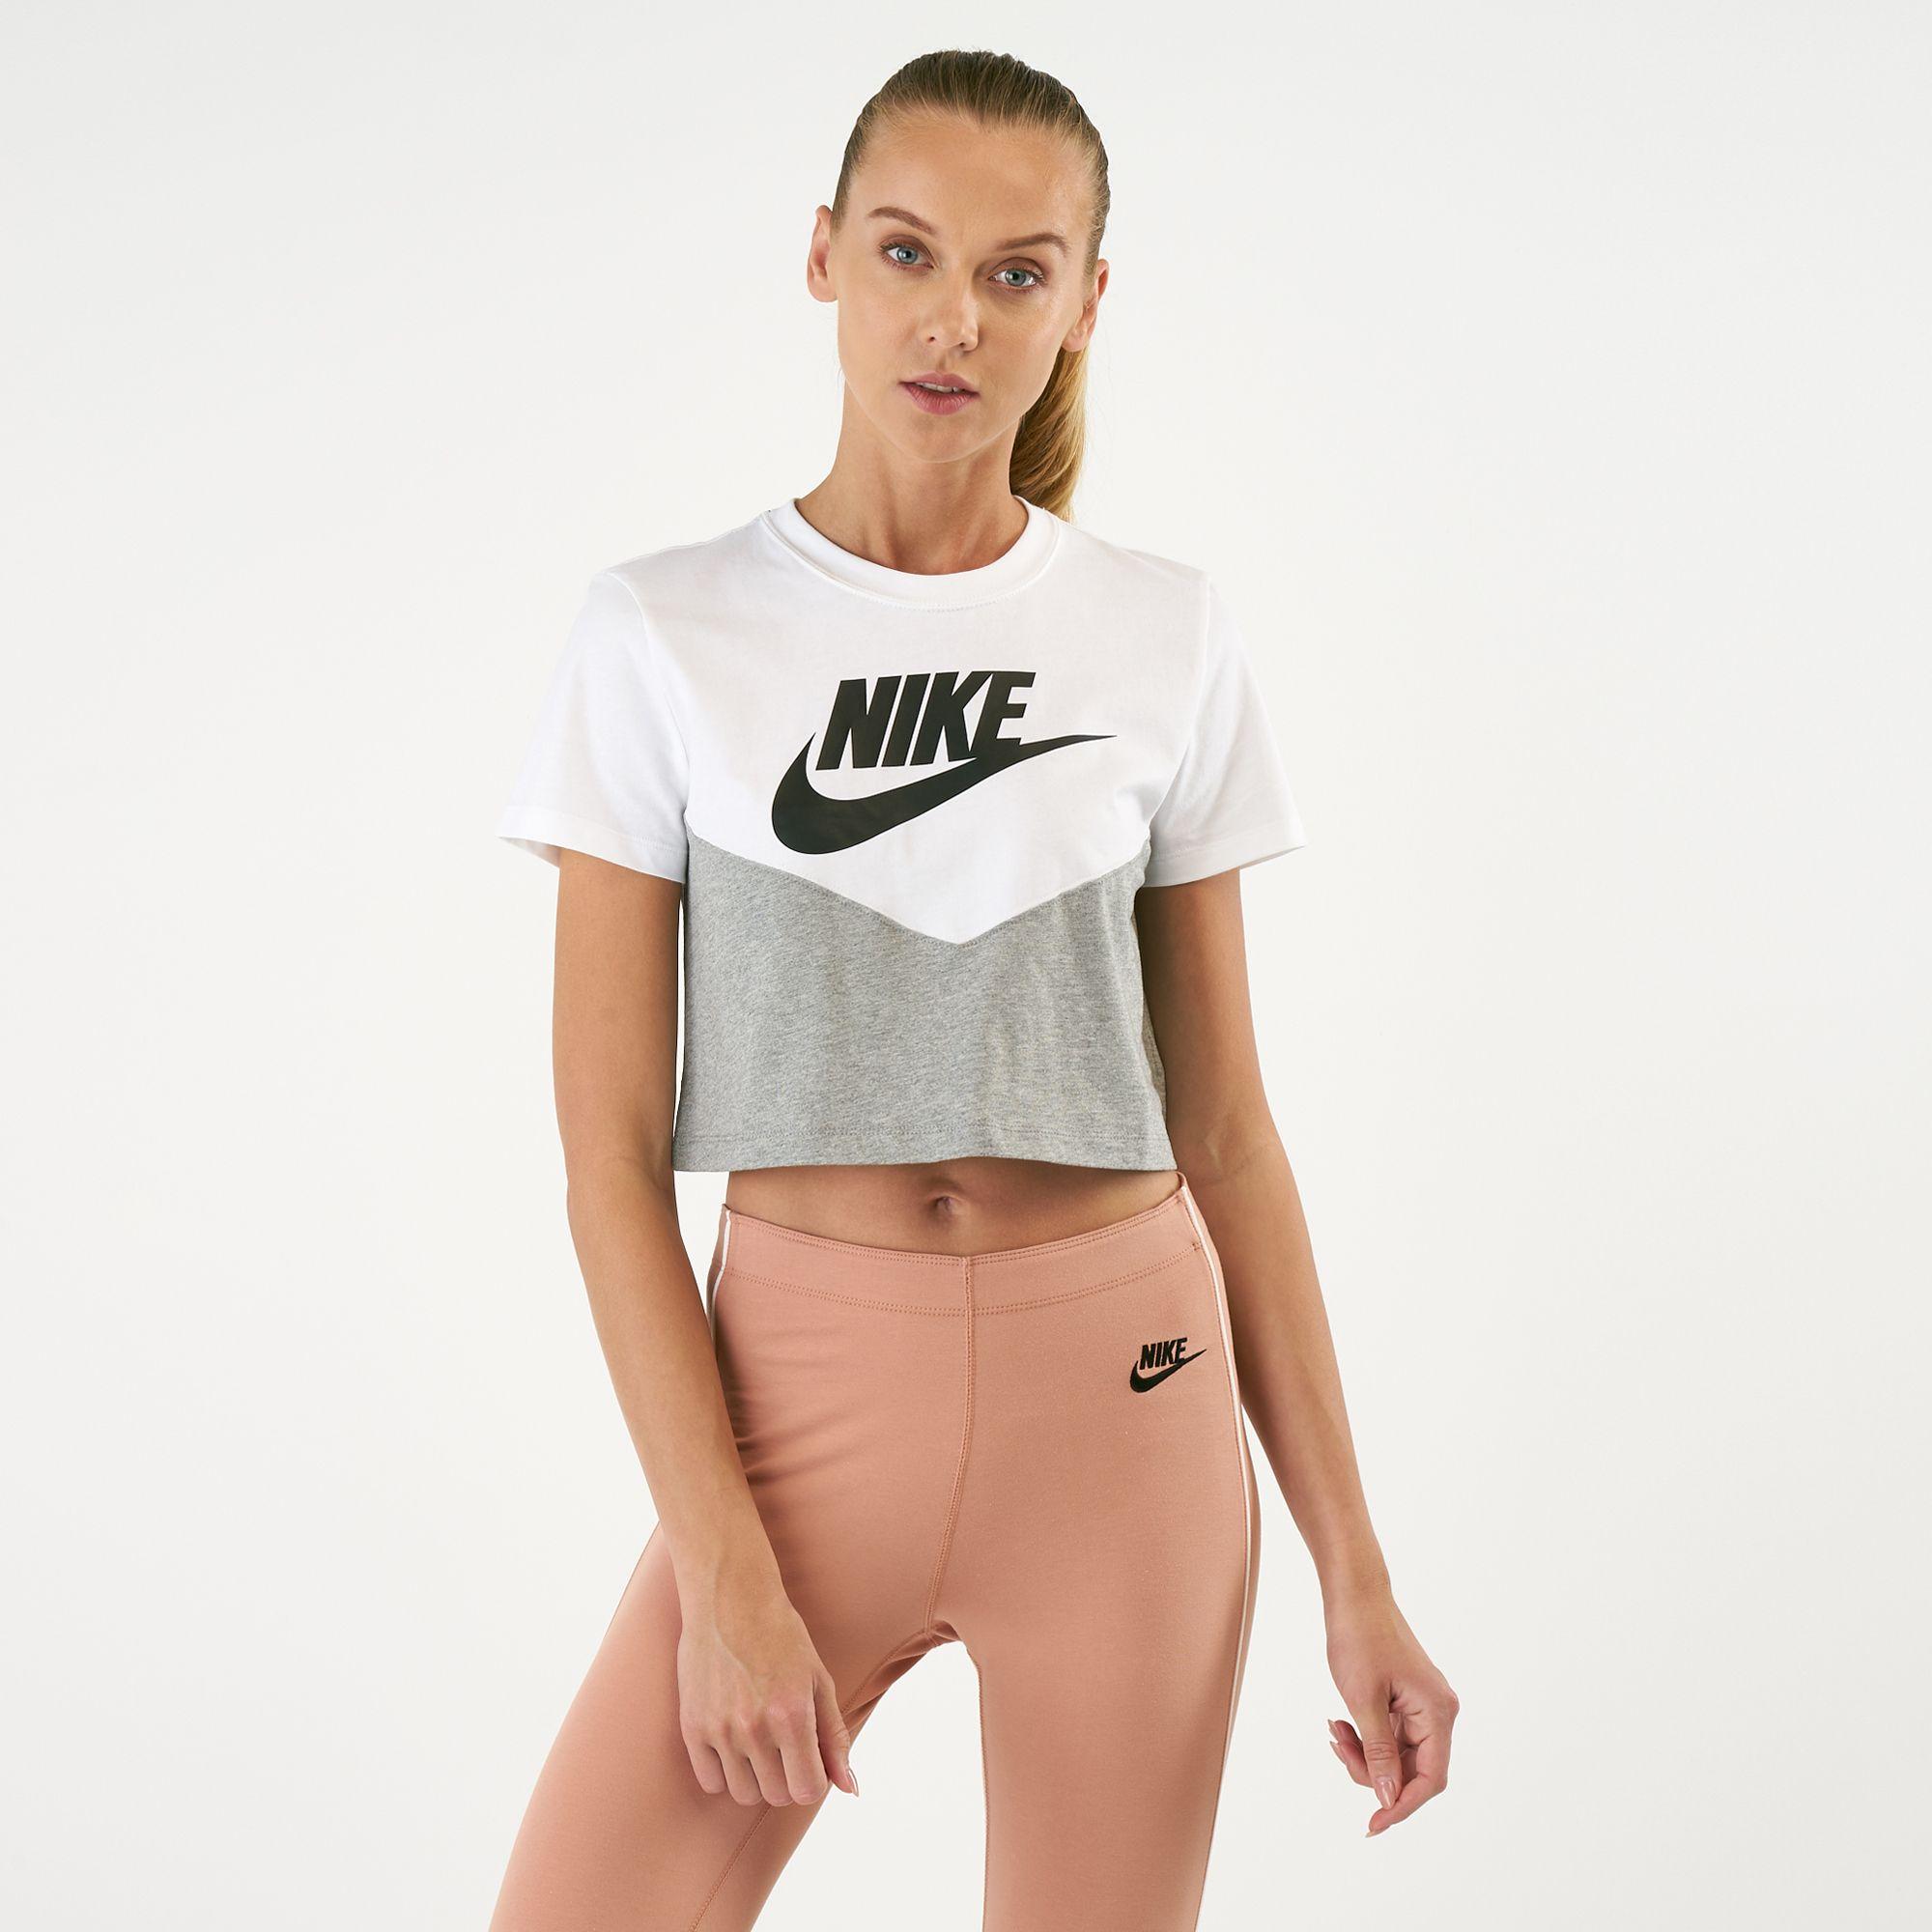 60ad0c8c Nike Women's Sportswear Heritage T-Shirt | T-Shirts | Tops | Clothing |  Womens | SSS